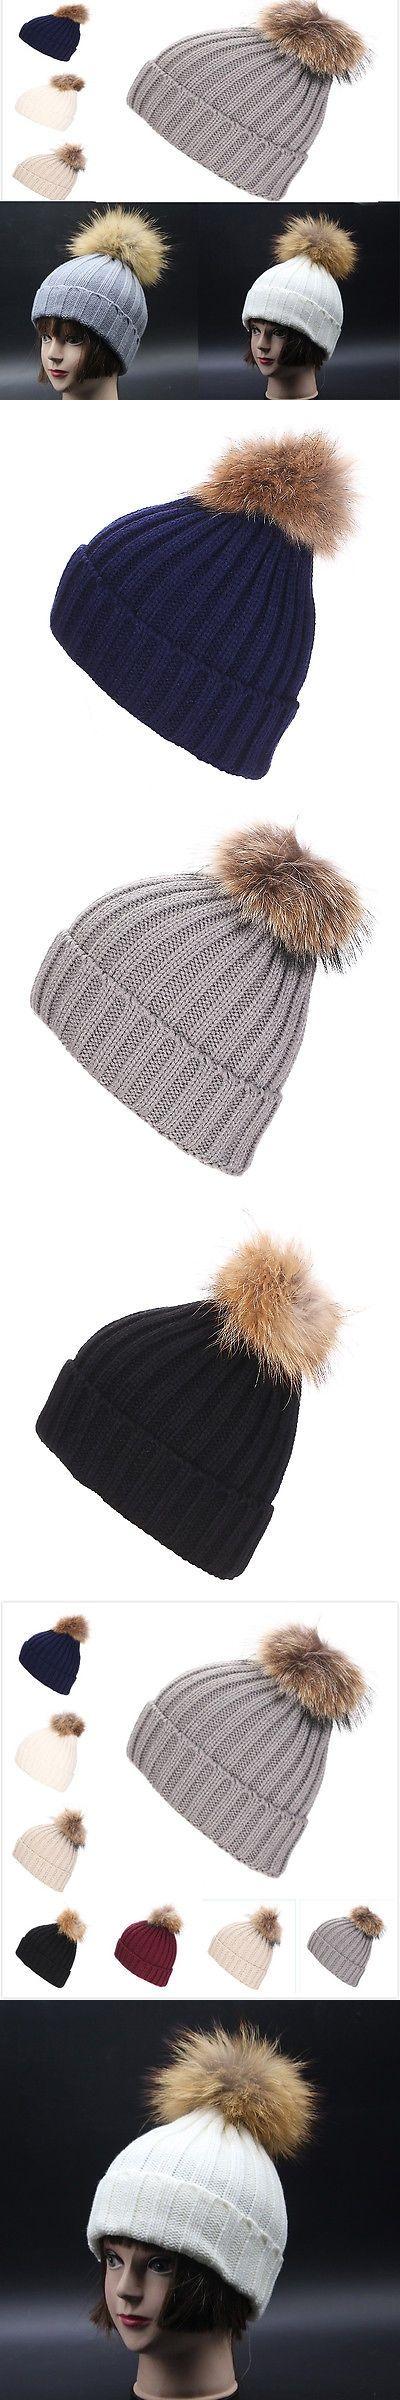 Autumn Winter Unisexe Men Women knitted bobble hat Large Cap Winter Warm Ski Hat